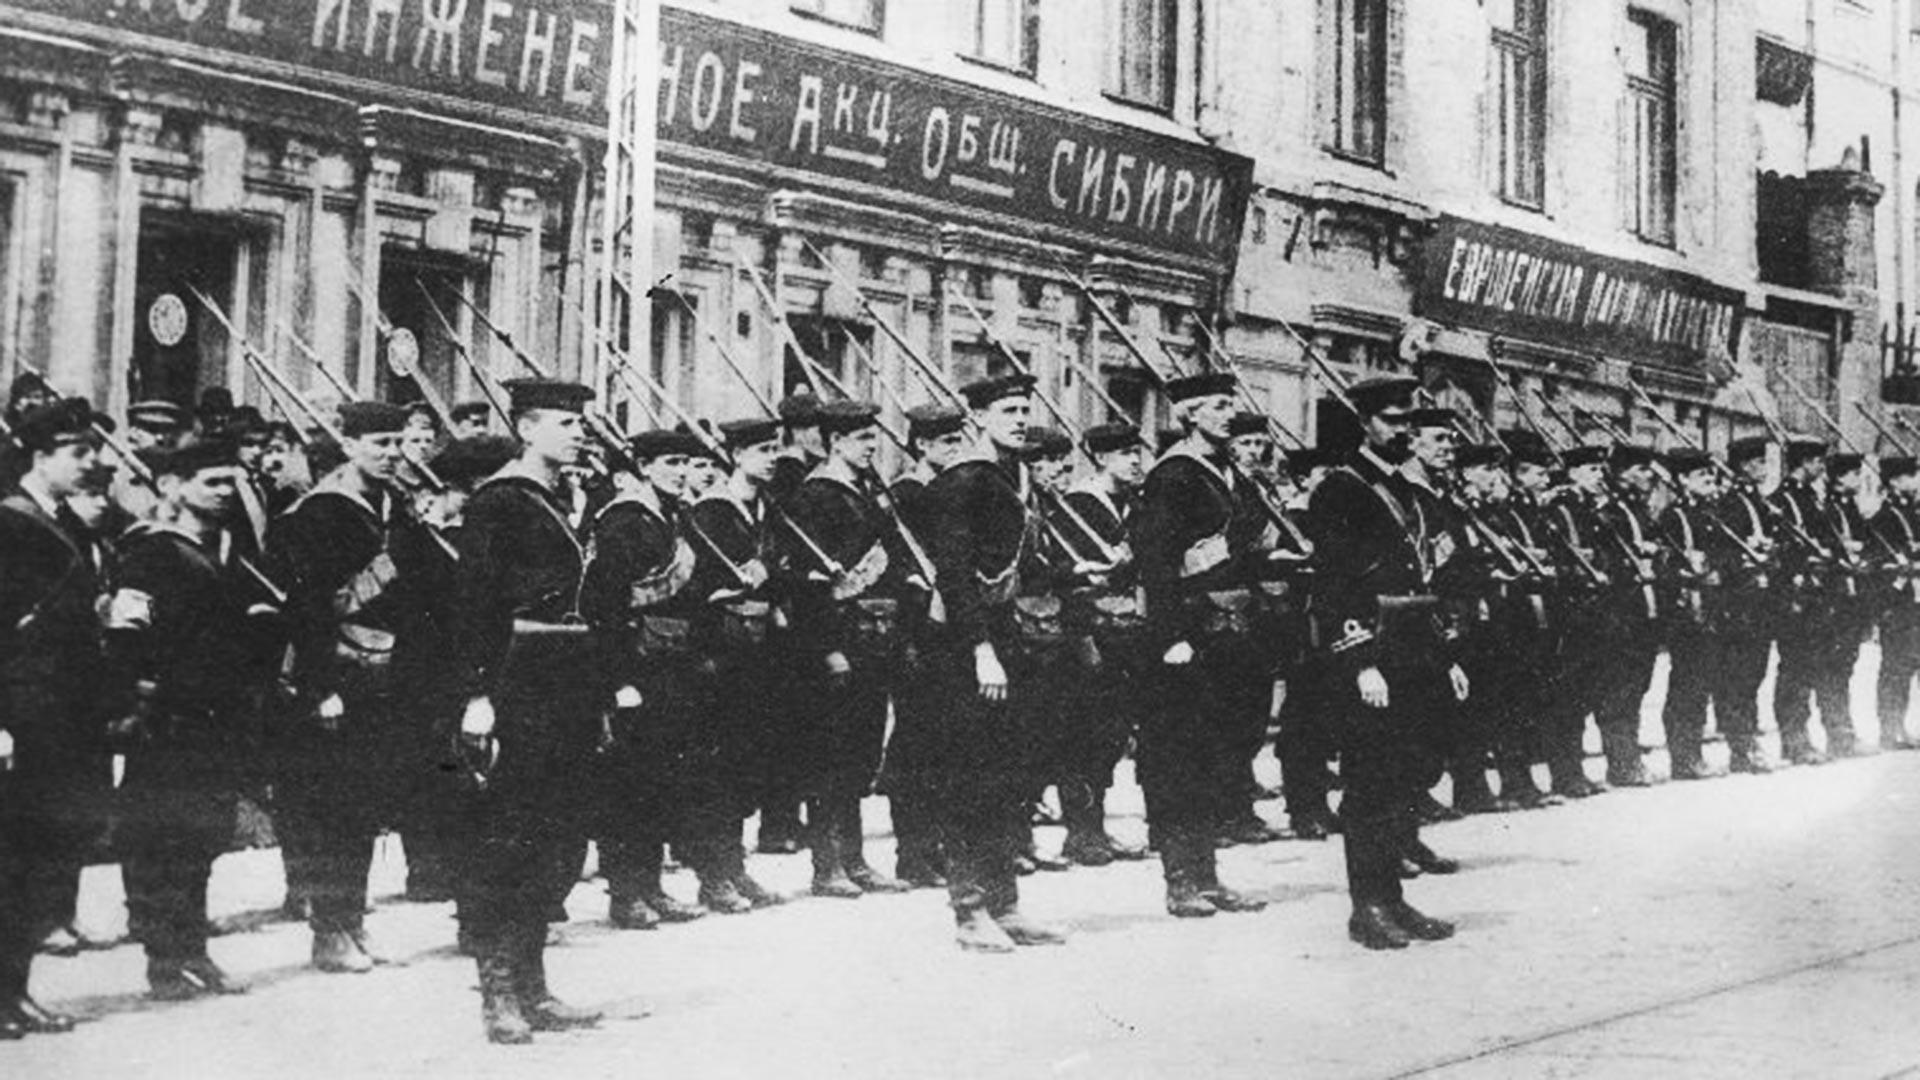 Britanski padobranci ispred konzulata za vrijeme strane vojne intervencije.